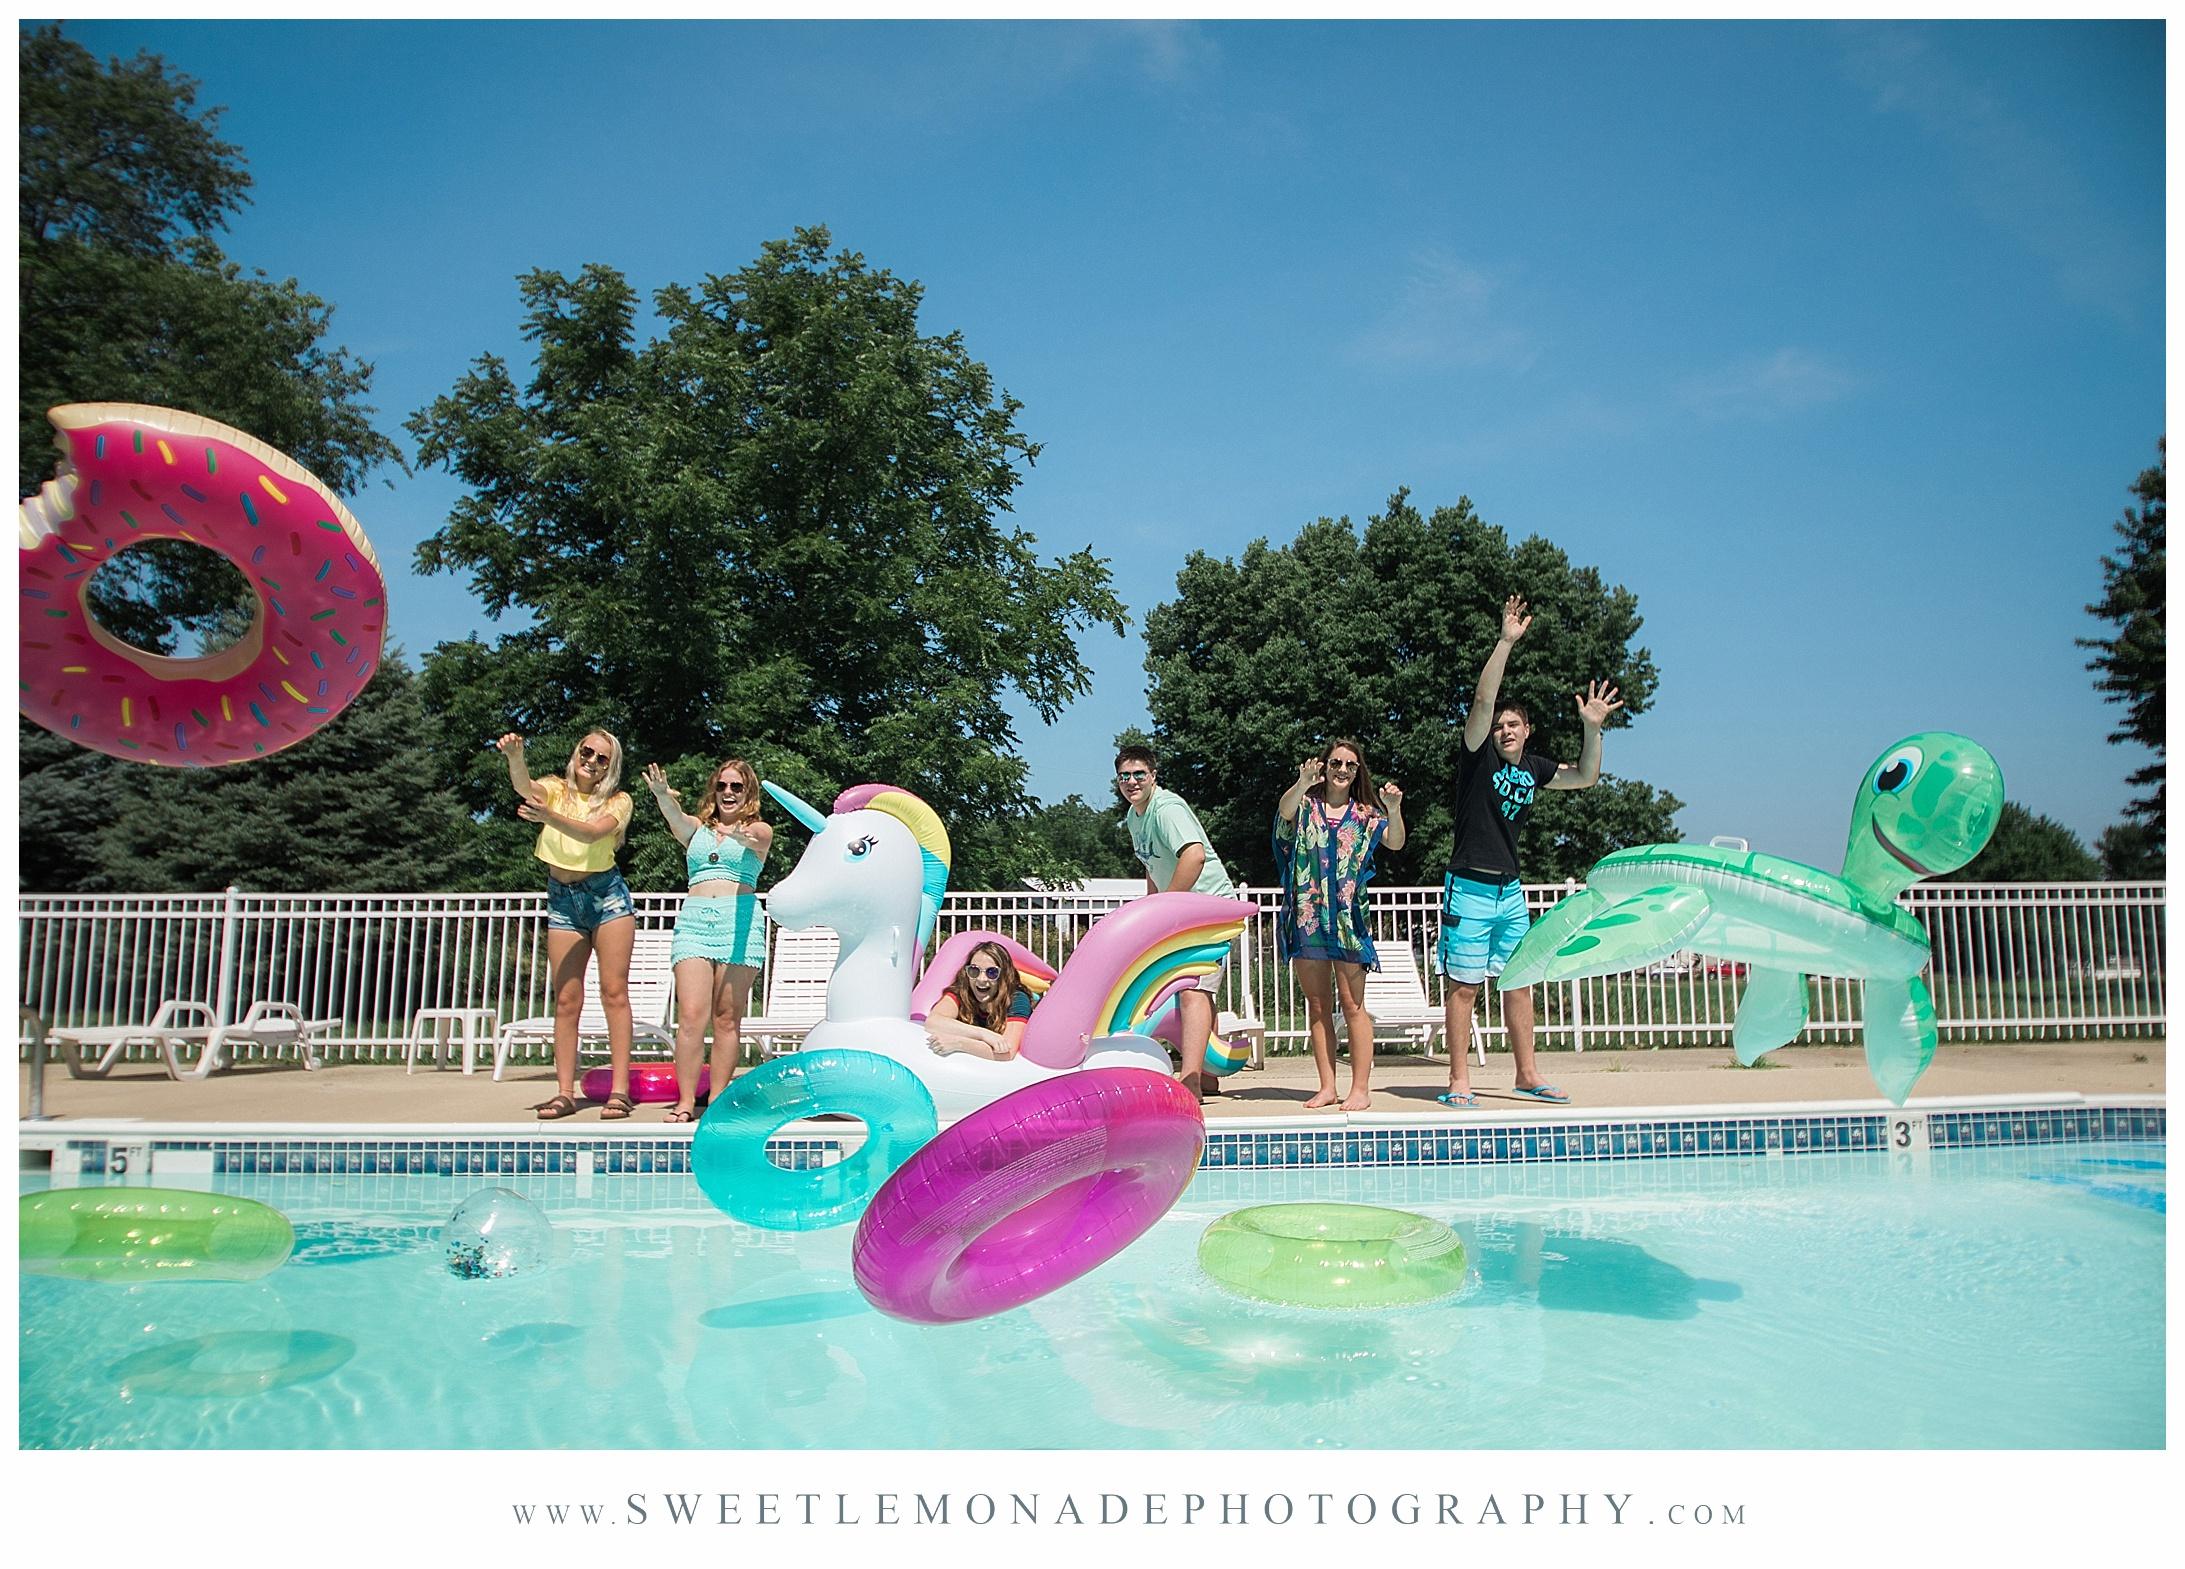 champaign-senior-photographer-sweet-lemonade-photography-senior-pictures-pool_2162.jpg